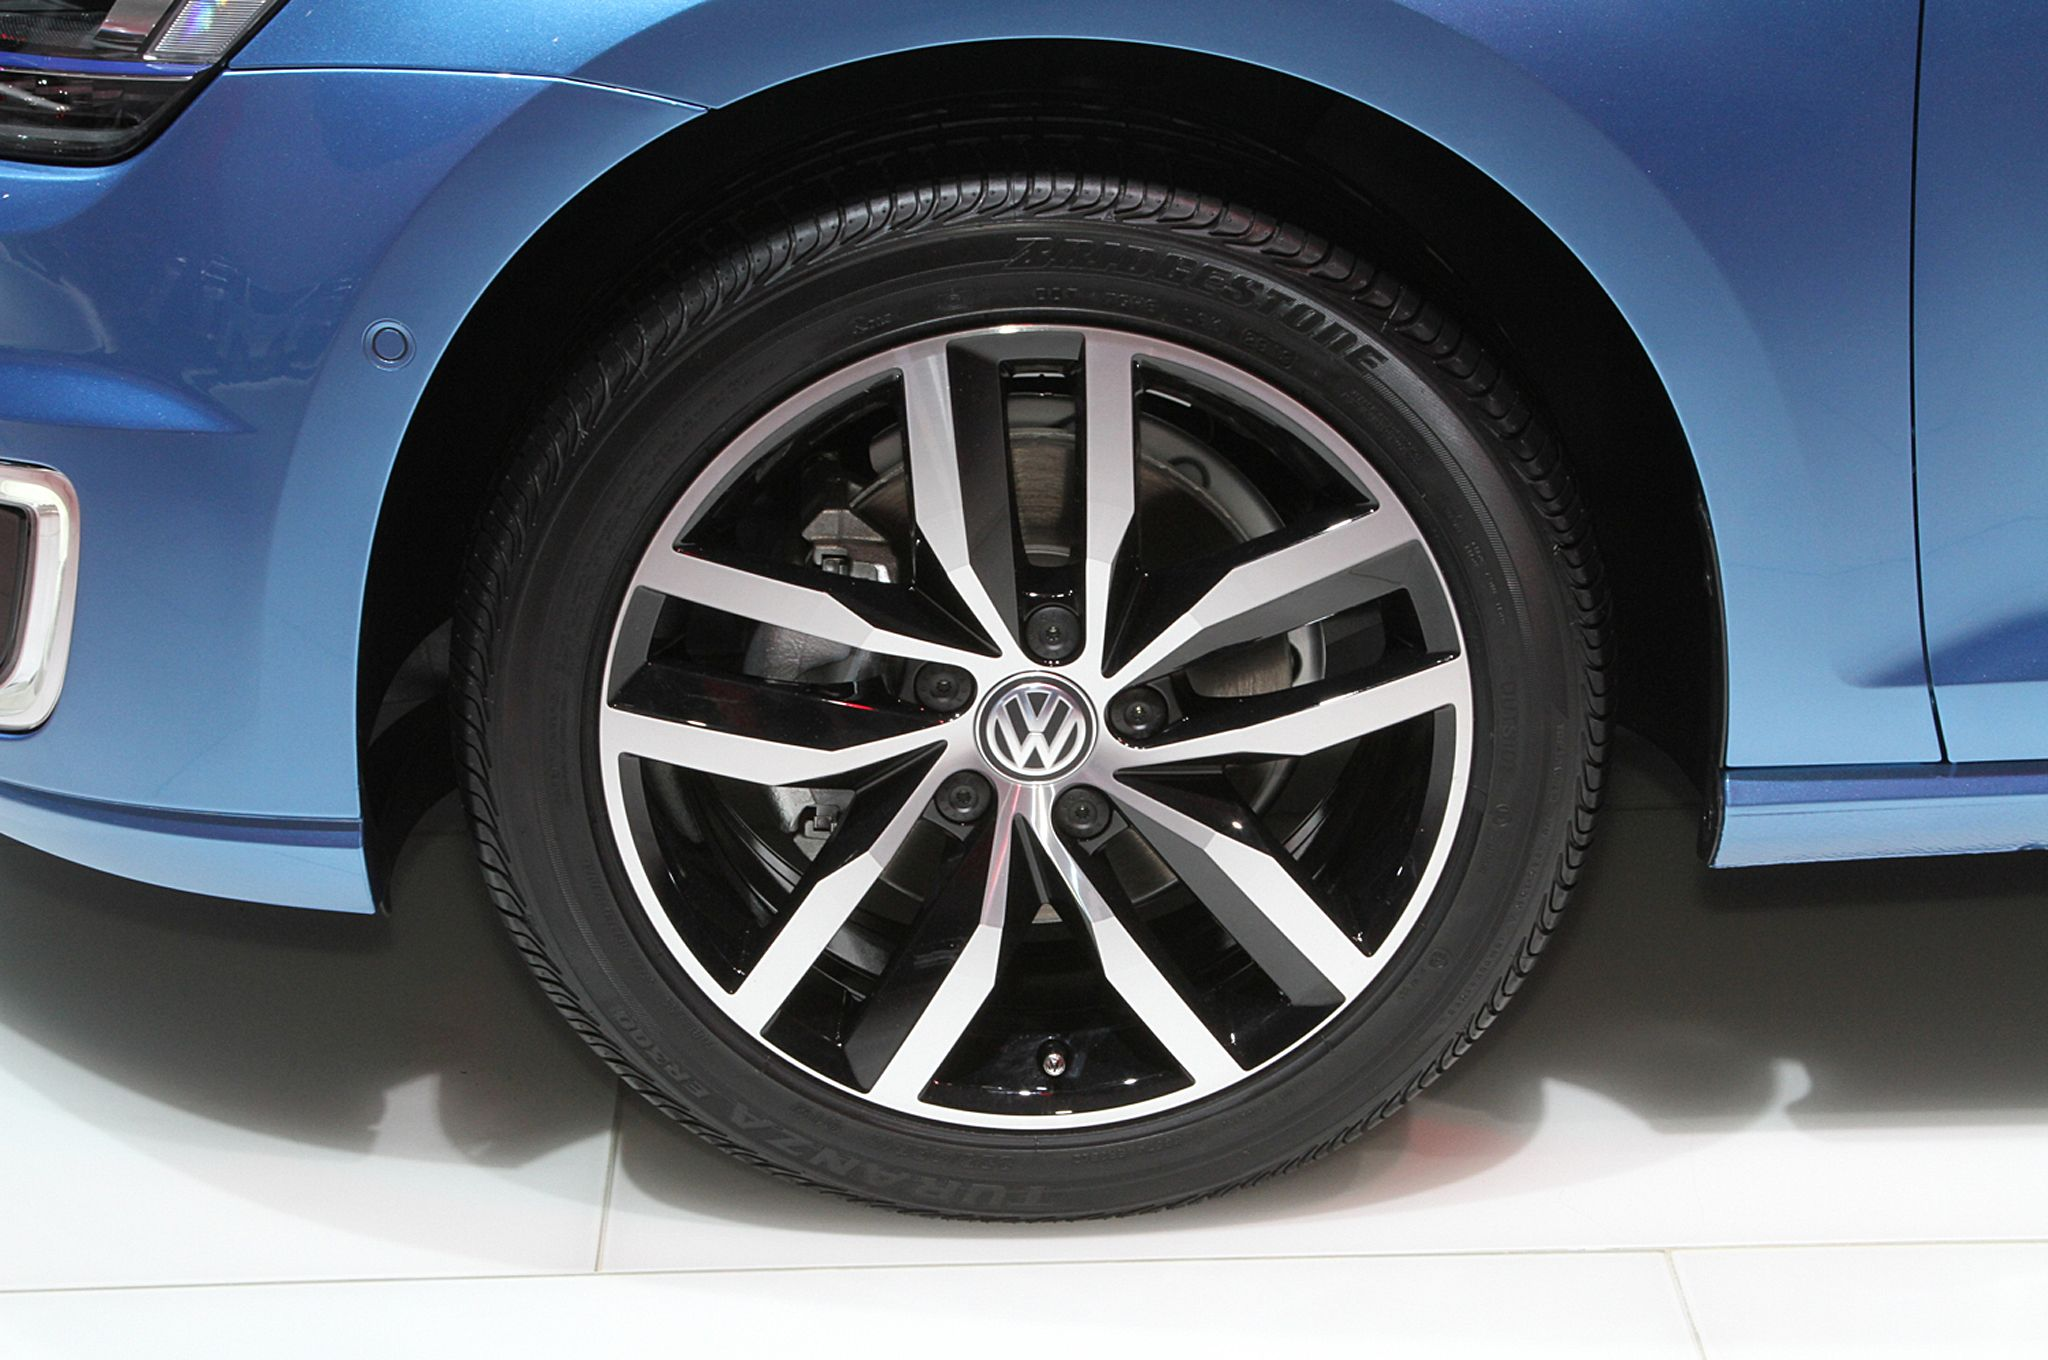 Volkswagen E Golf Wheels Photo 19